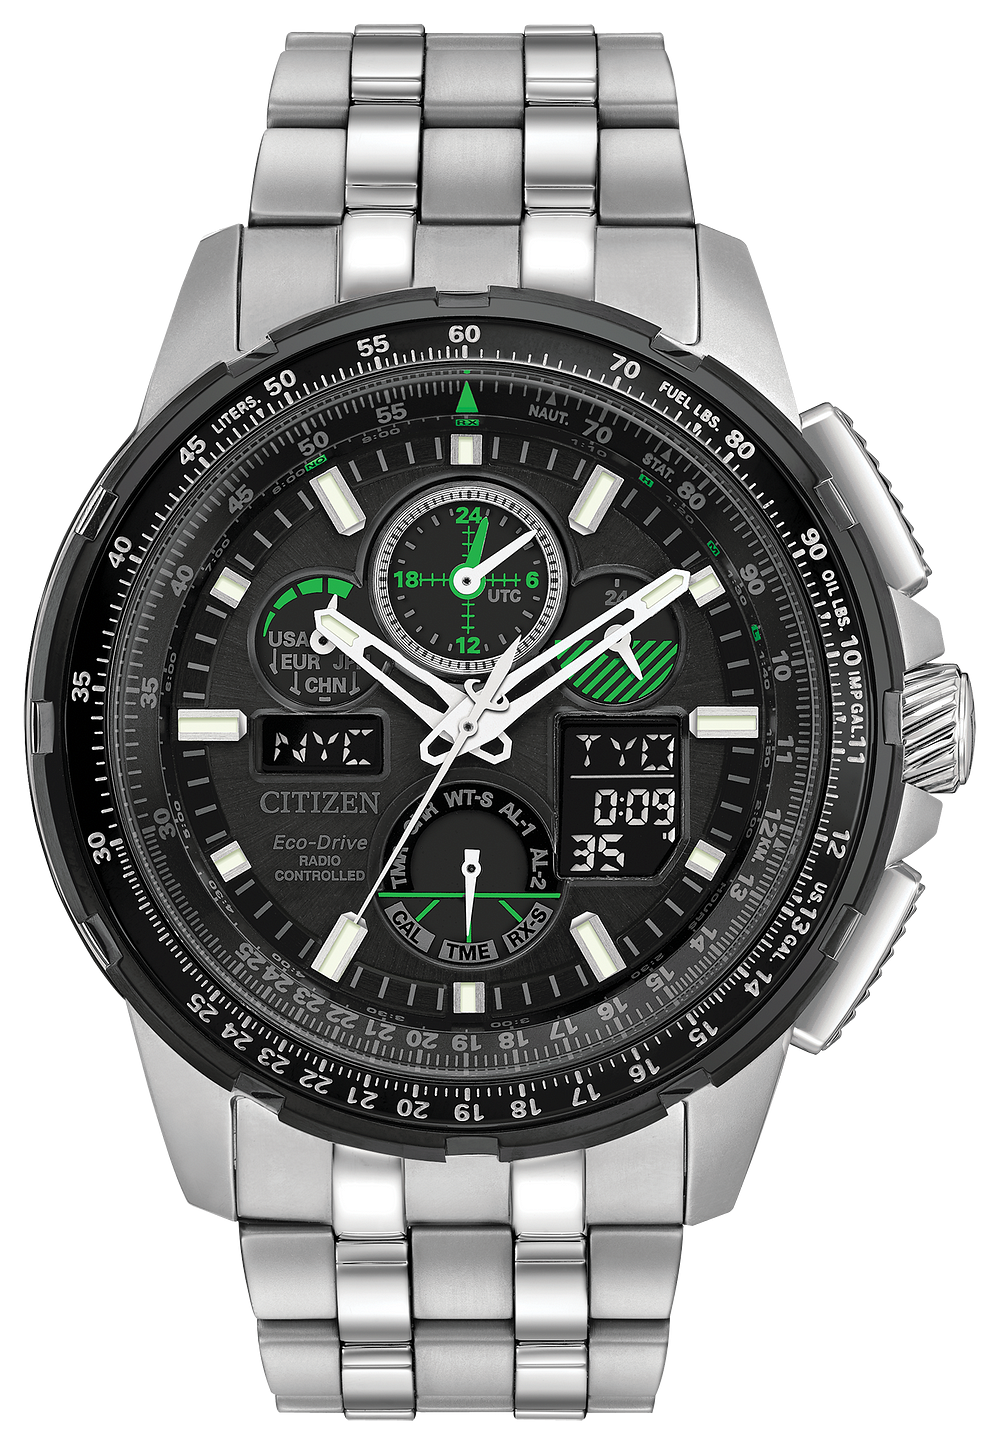 promaster skyhawk a t men s eco drive chronograph black watch rh citizenwatch com citizen skyhawk manual pdf citizen skyhawk manual español